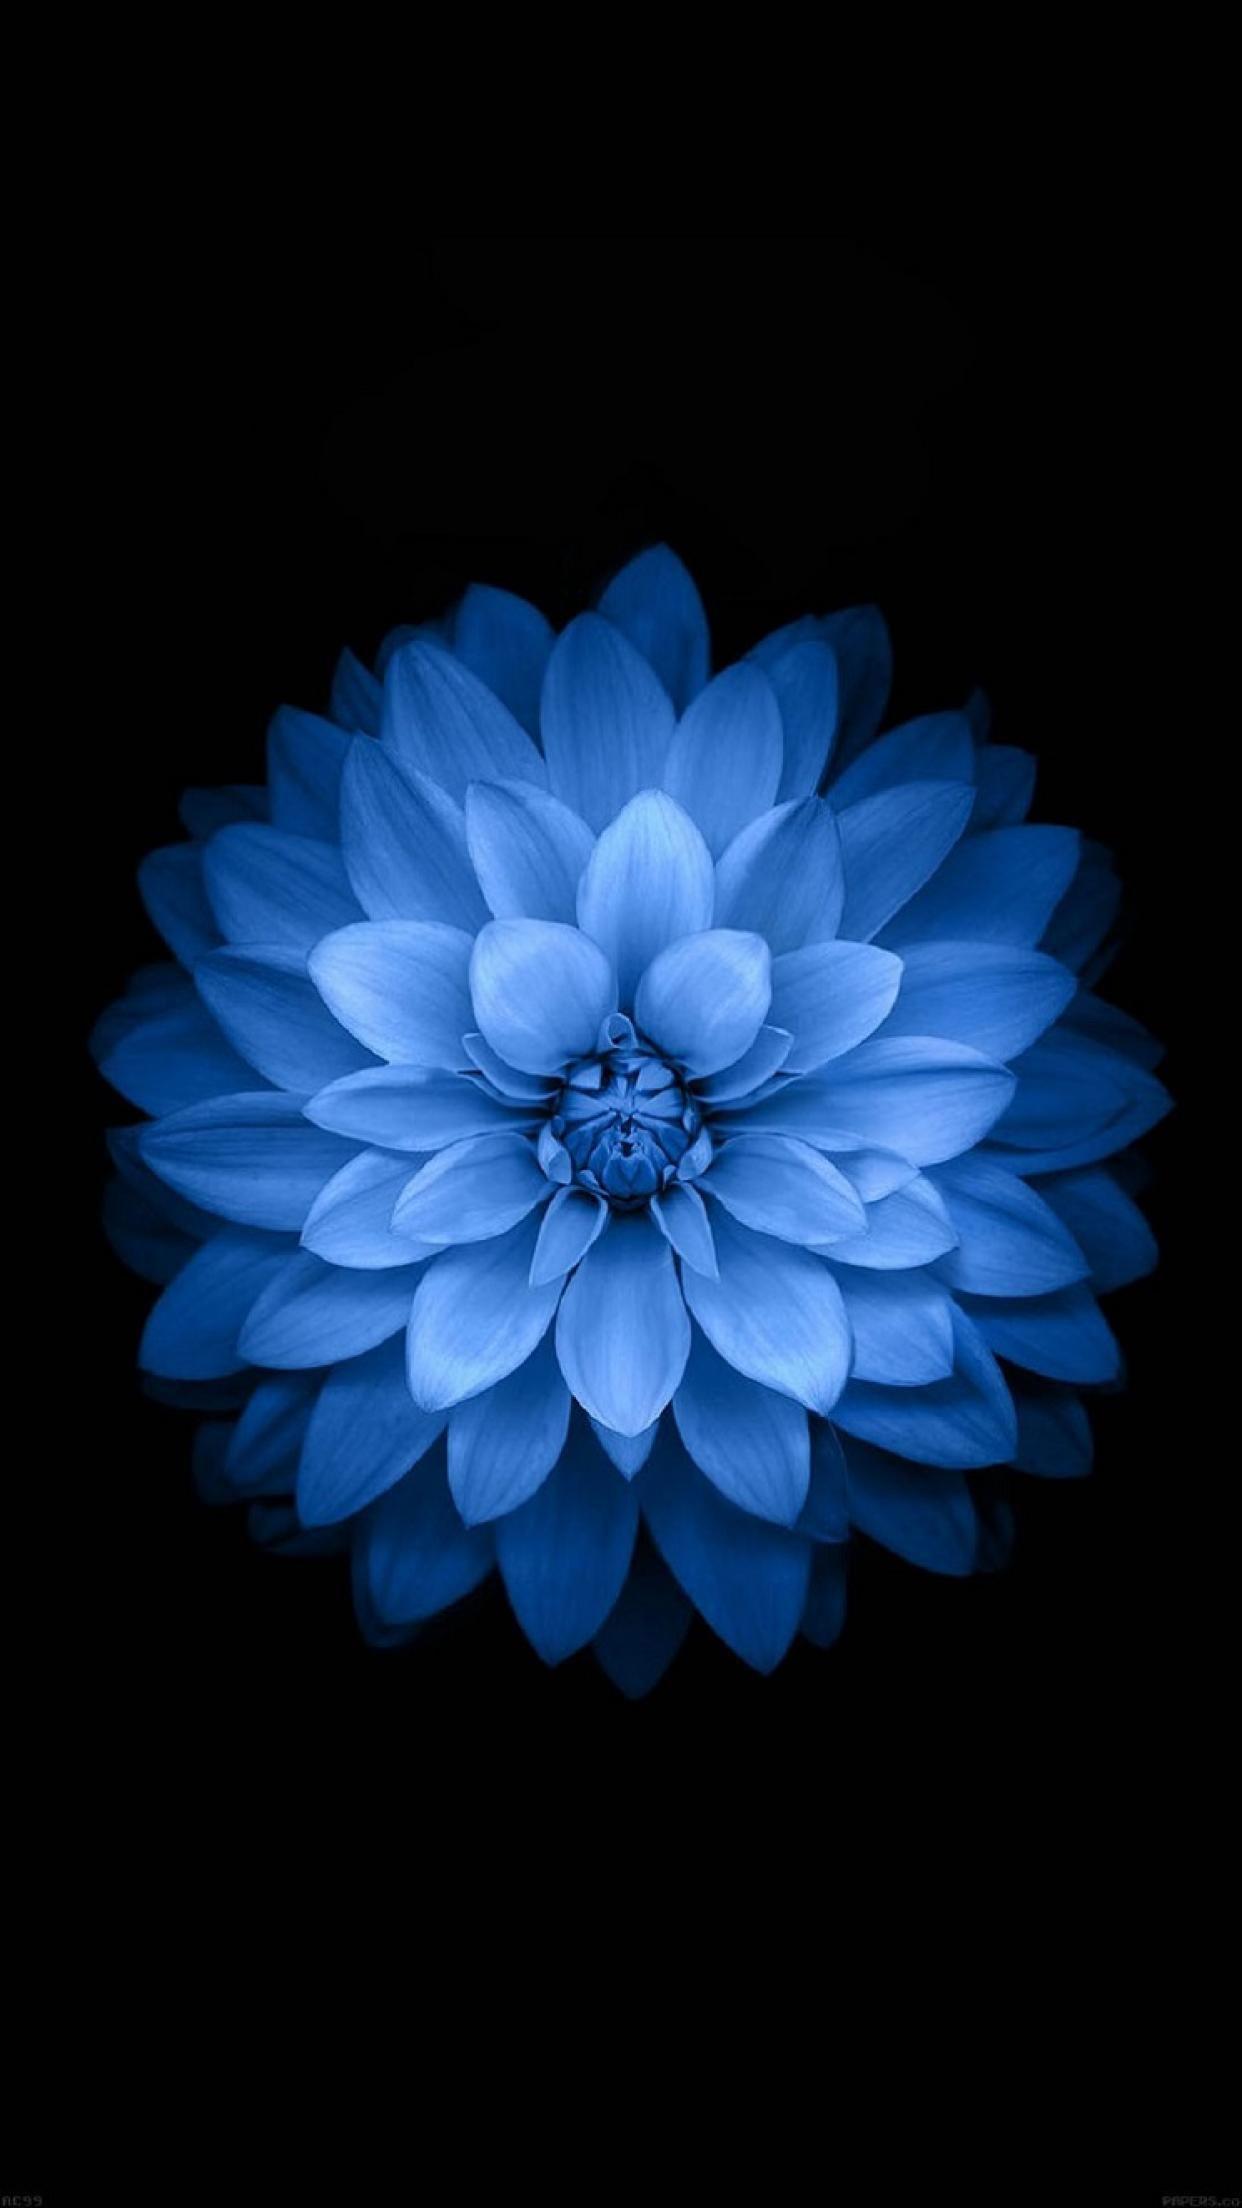 Permalink to Iphone 6 Wallpaper Flower